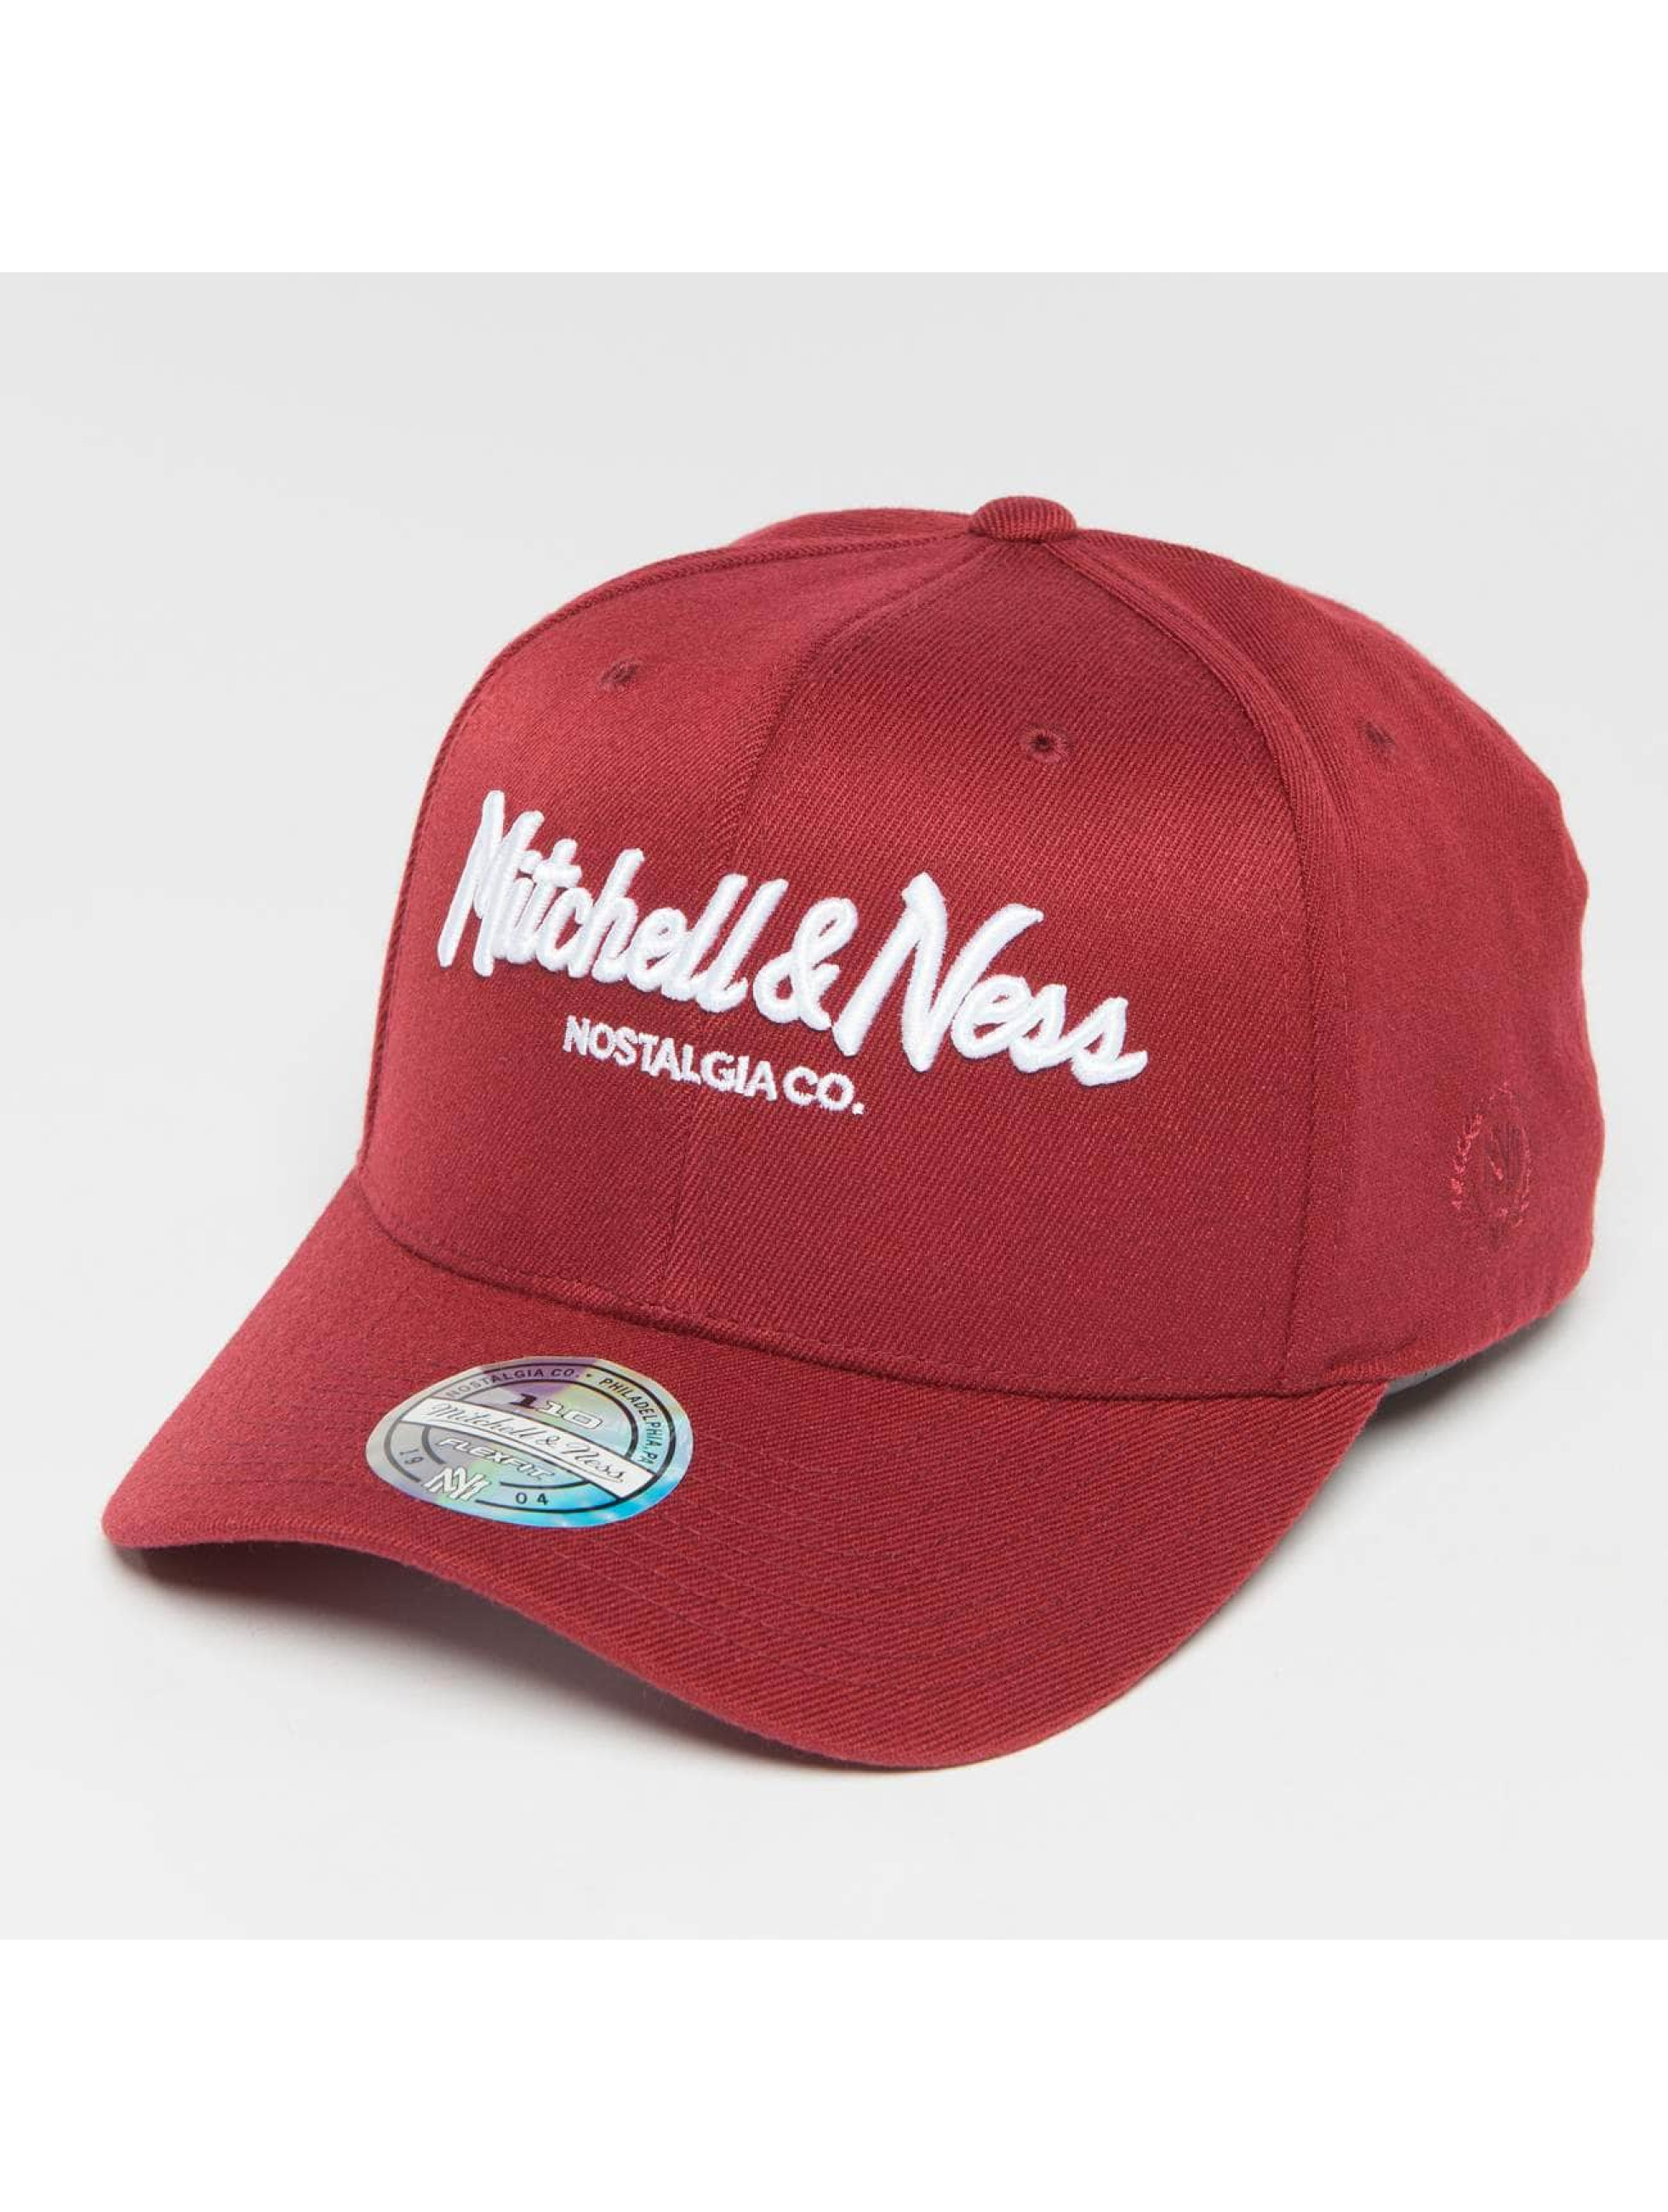 Mitchell & Ness snapback cap The Burgundy 2-Tone Pinscript 110 rood